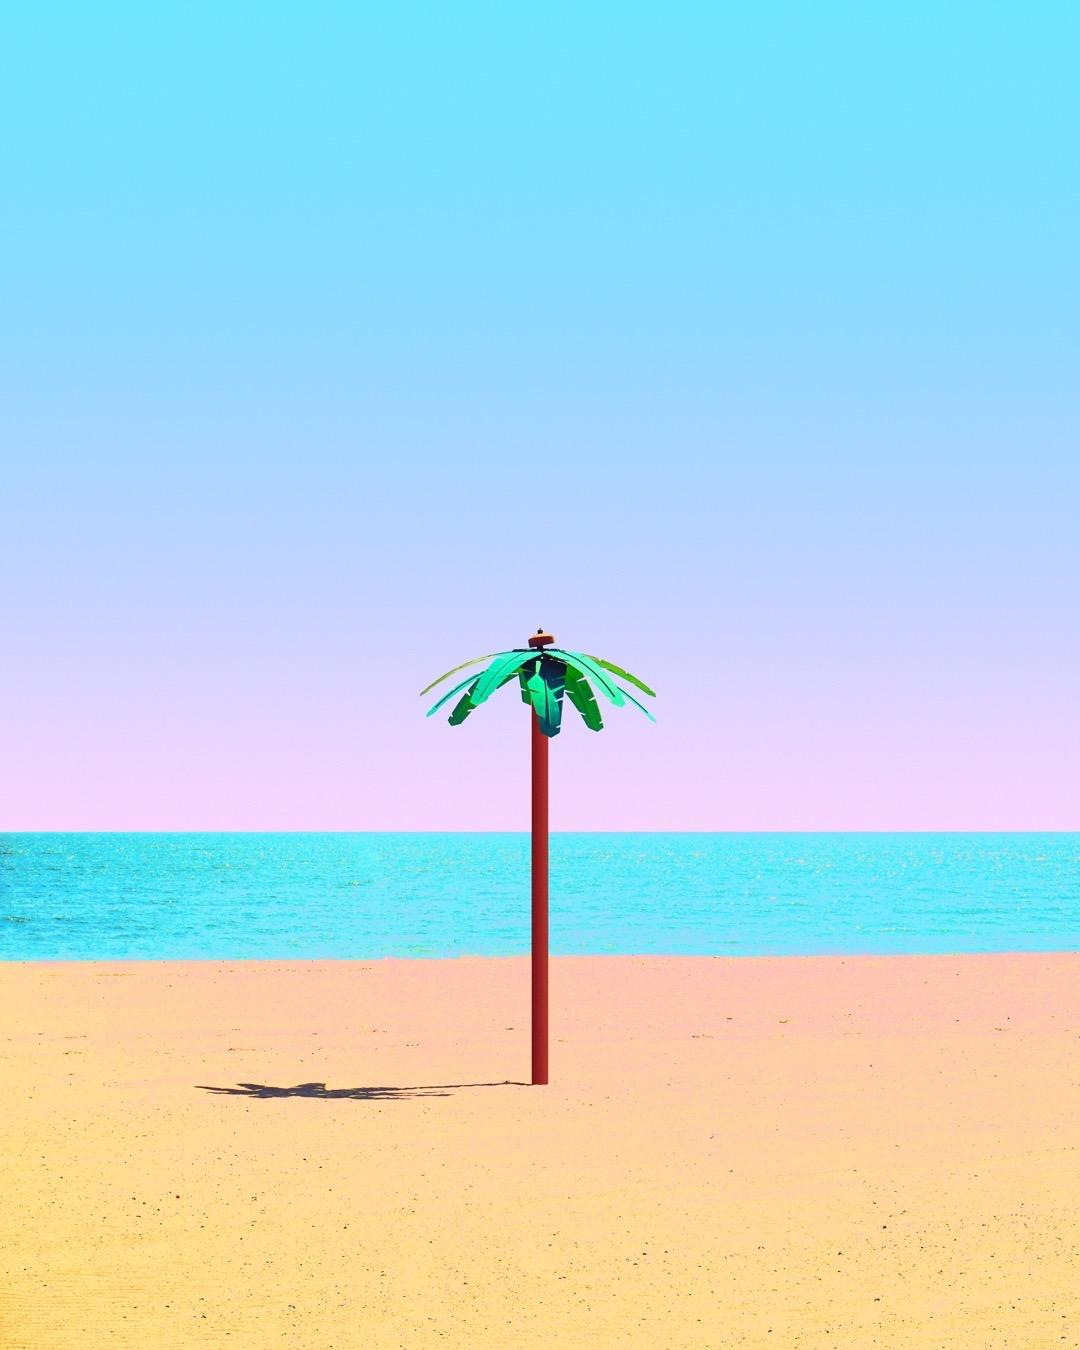 Sunset Beach Nature Palmtree Palmtrees California Sea Ocean Gradient Pink Blue Yellow Orange Symmetry Pastel Pastels Aesthetic Color Crump Vsco